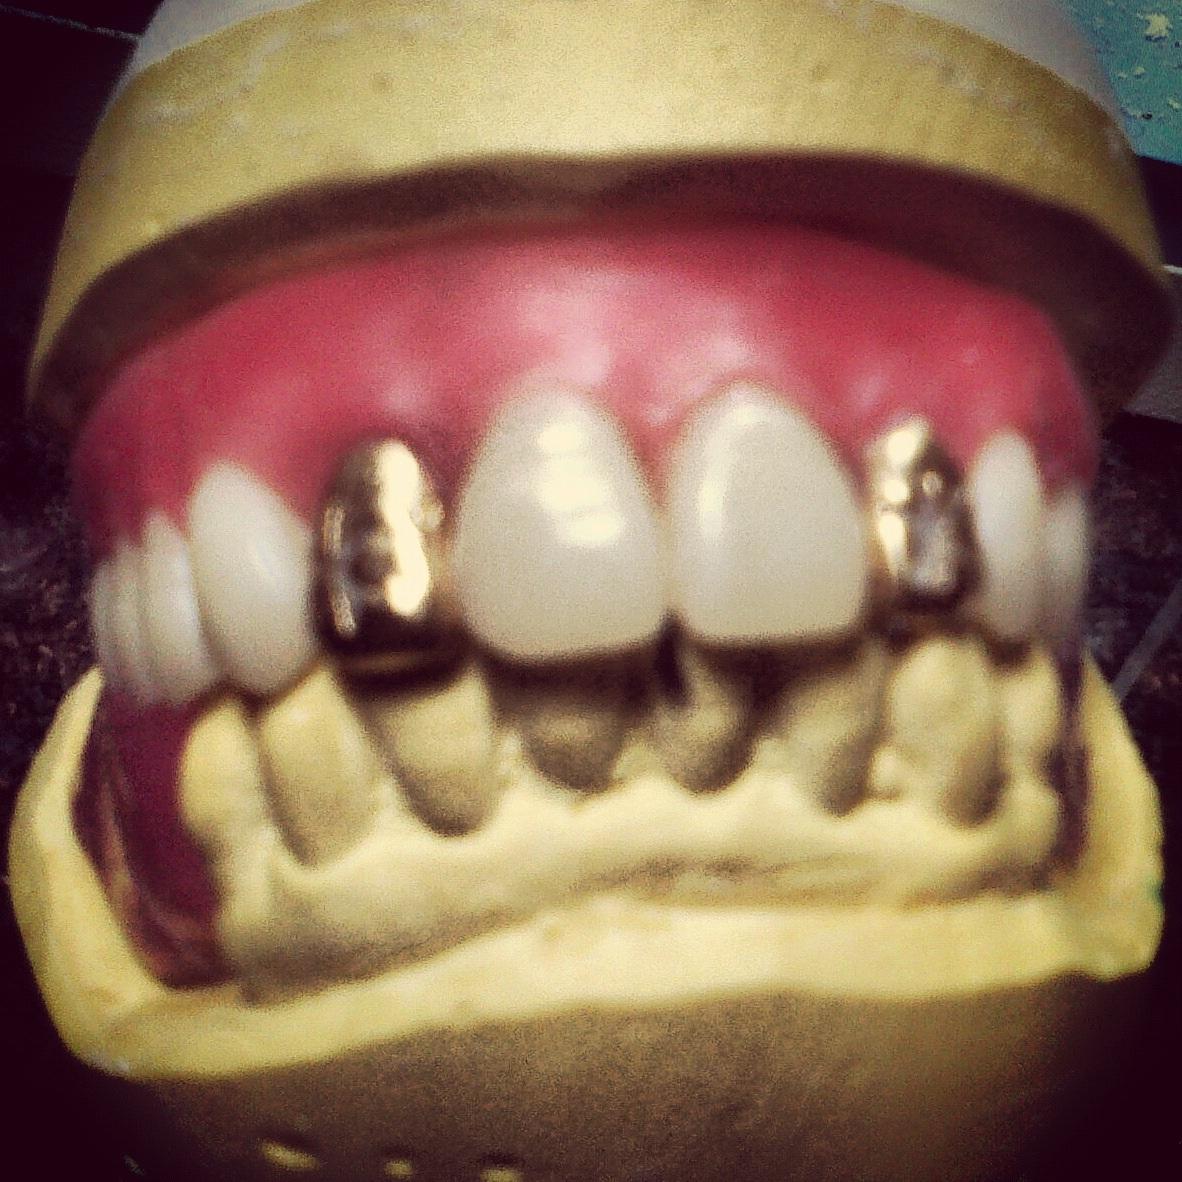 Gold Dentures